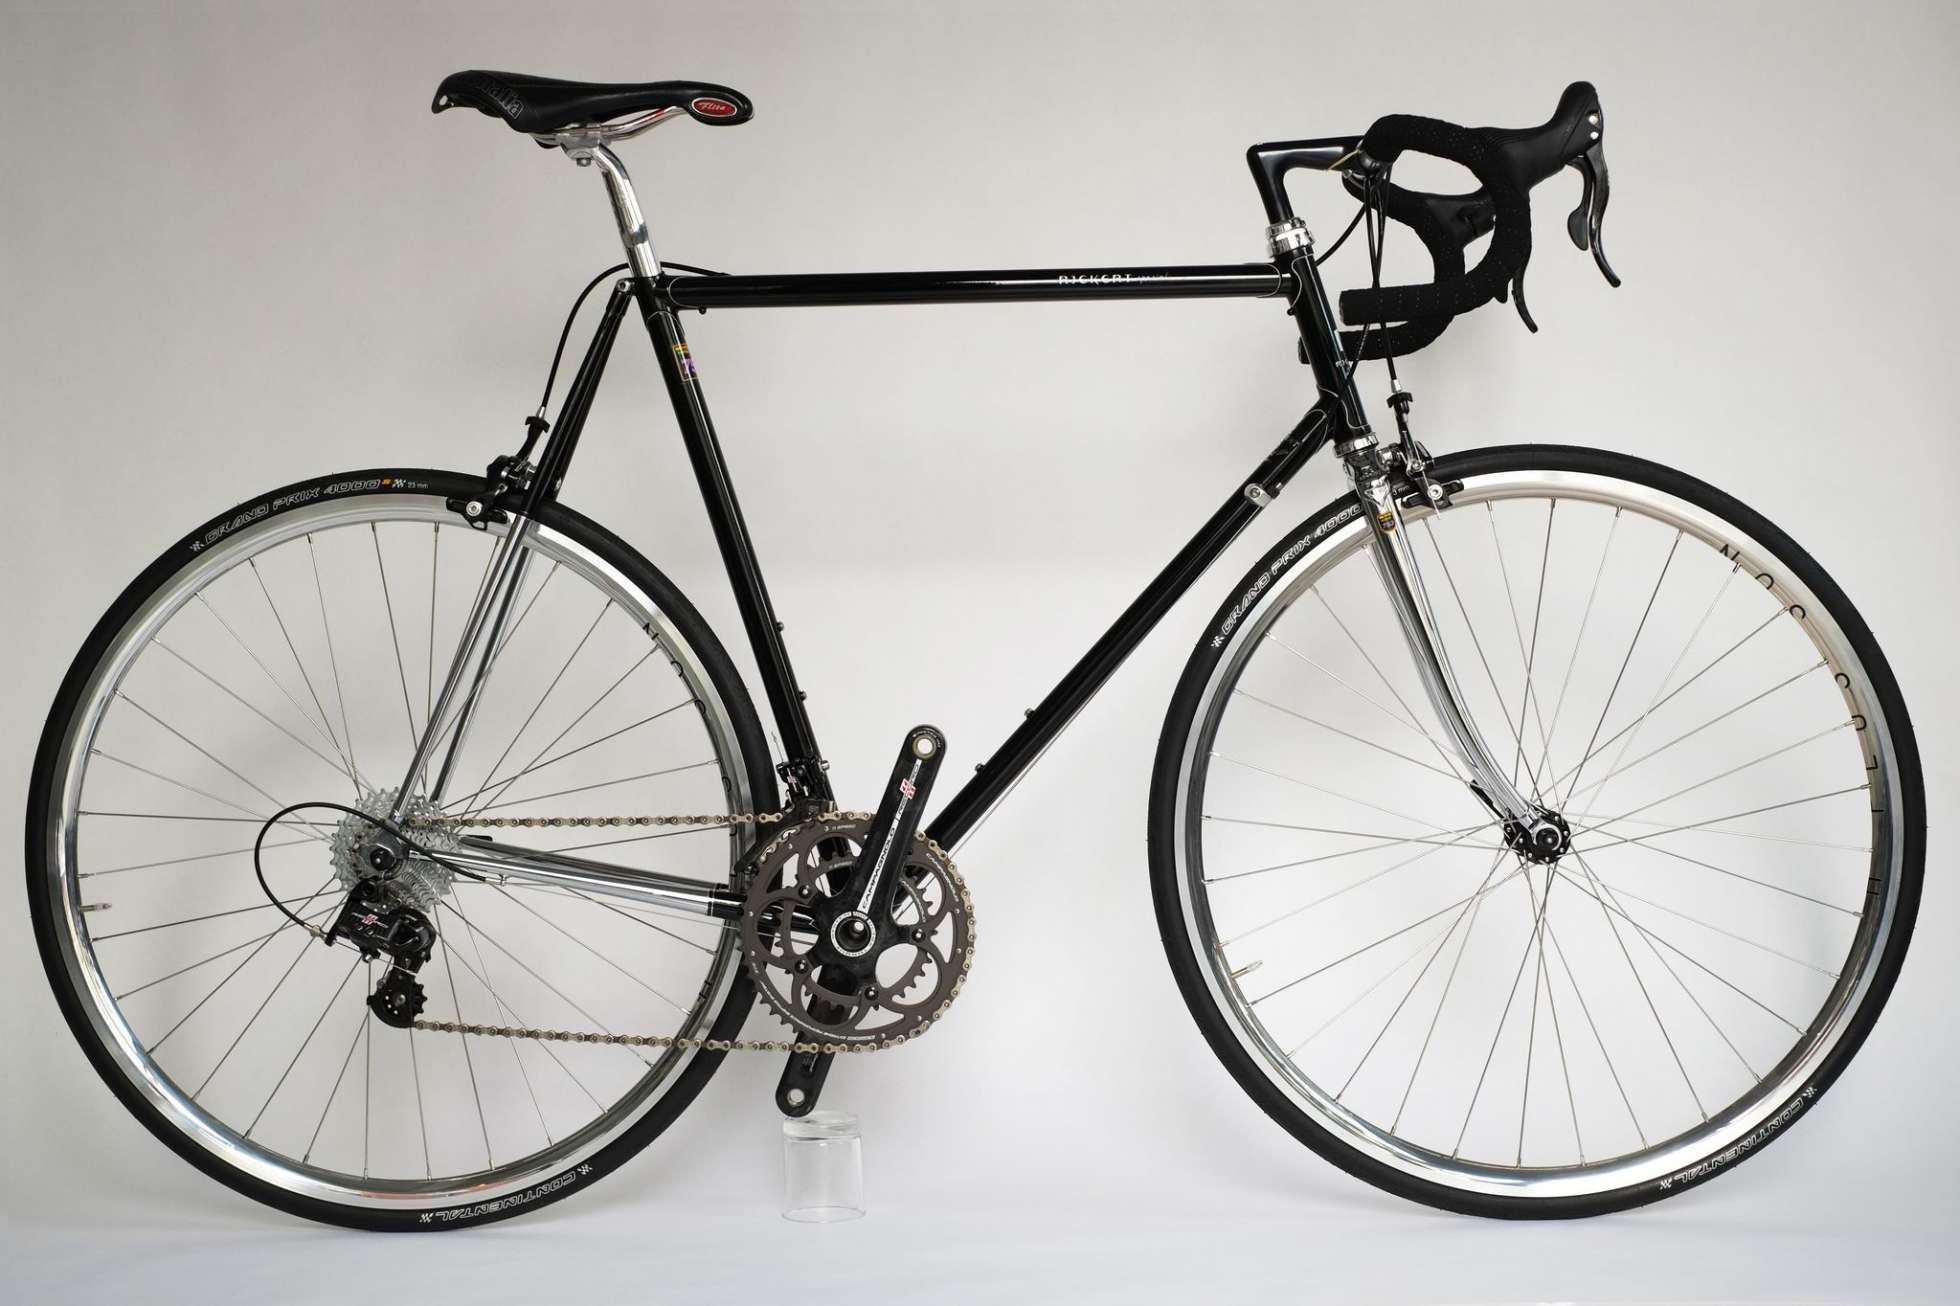 Hugo_Rickert_Spezial_Reynolds_753_Rennrad_Classic_Bike_01